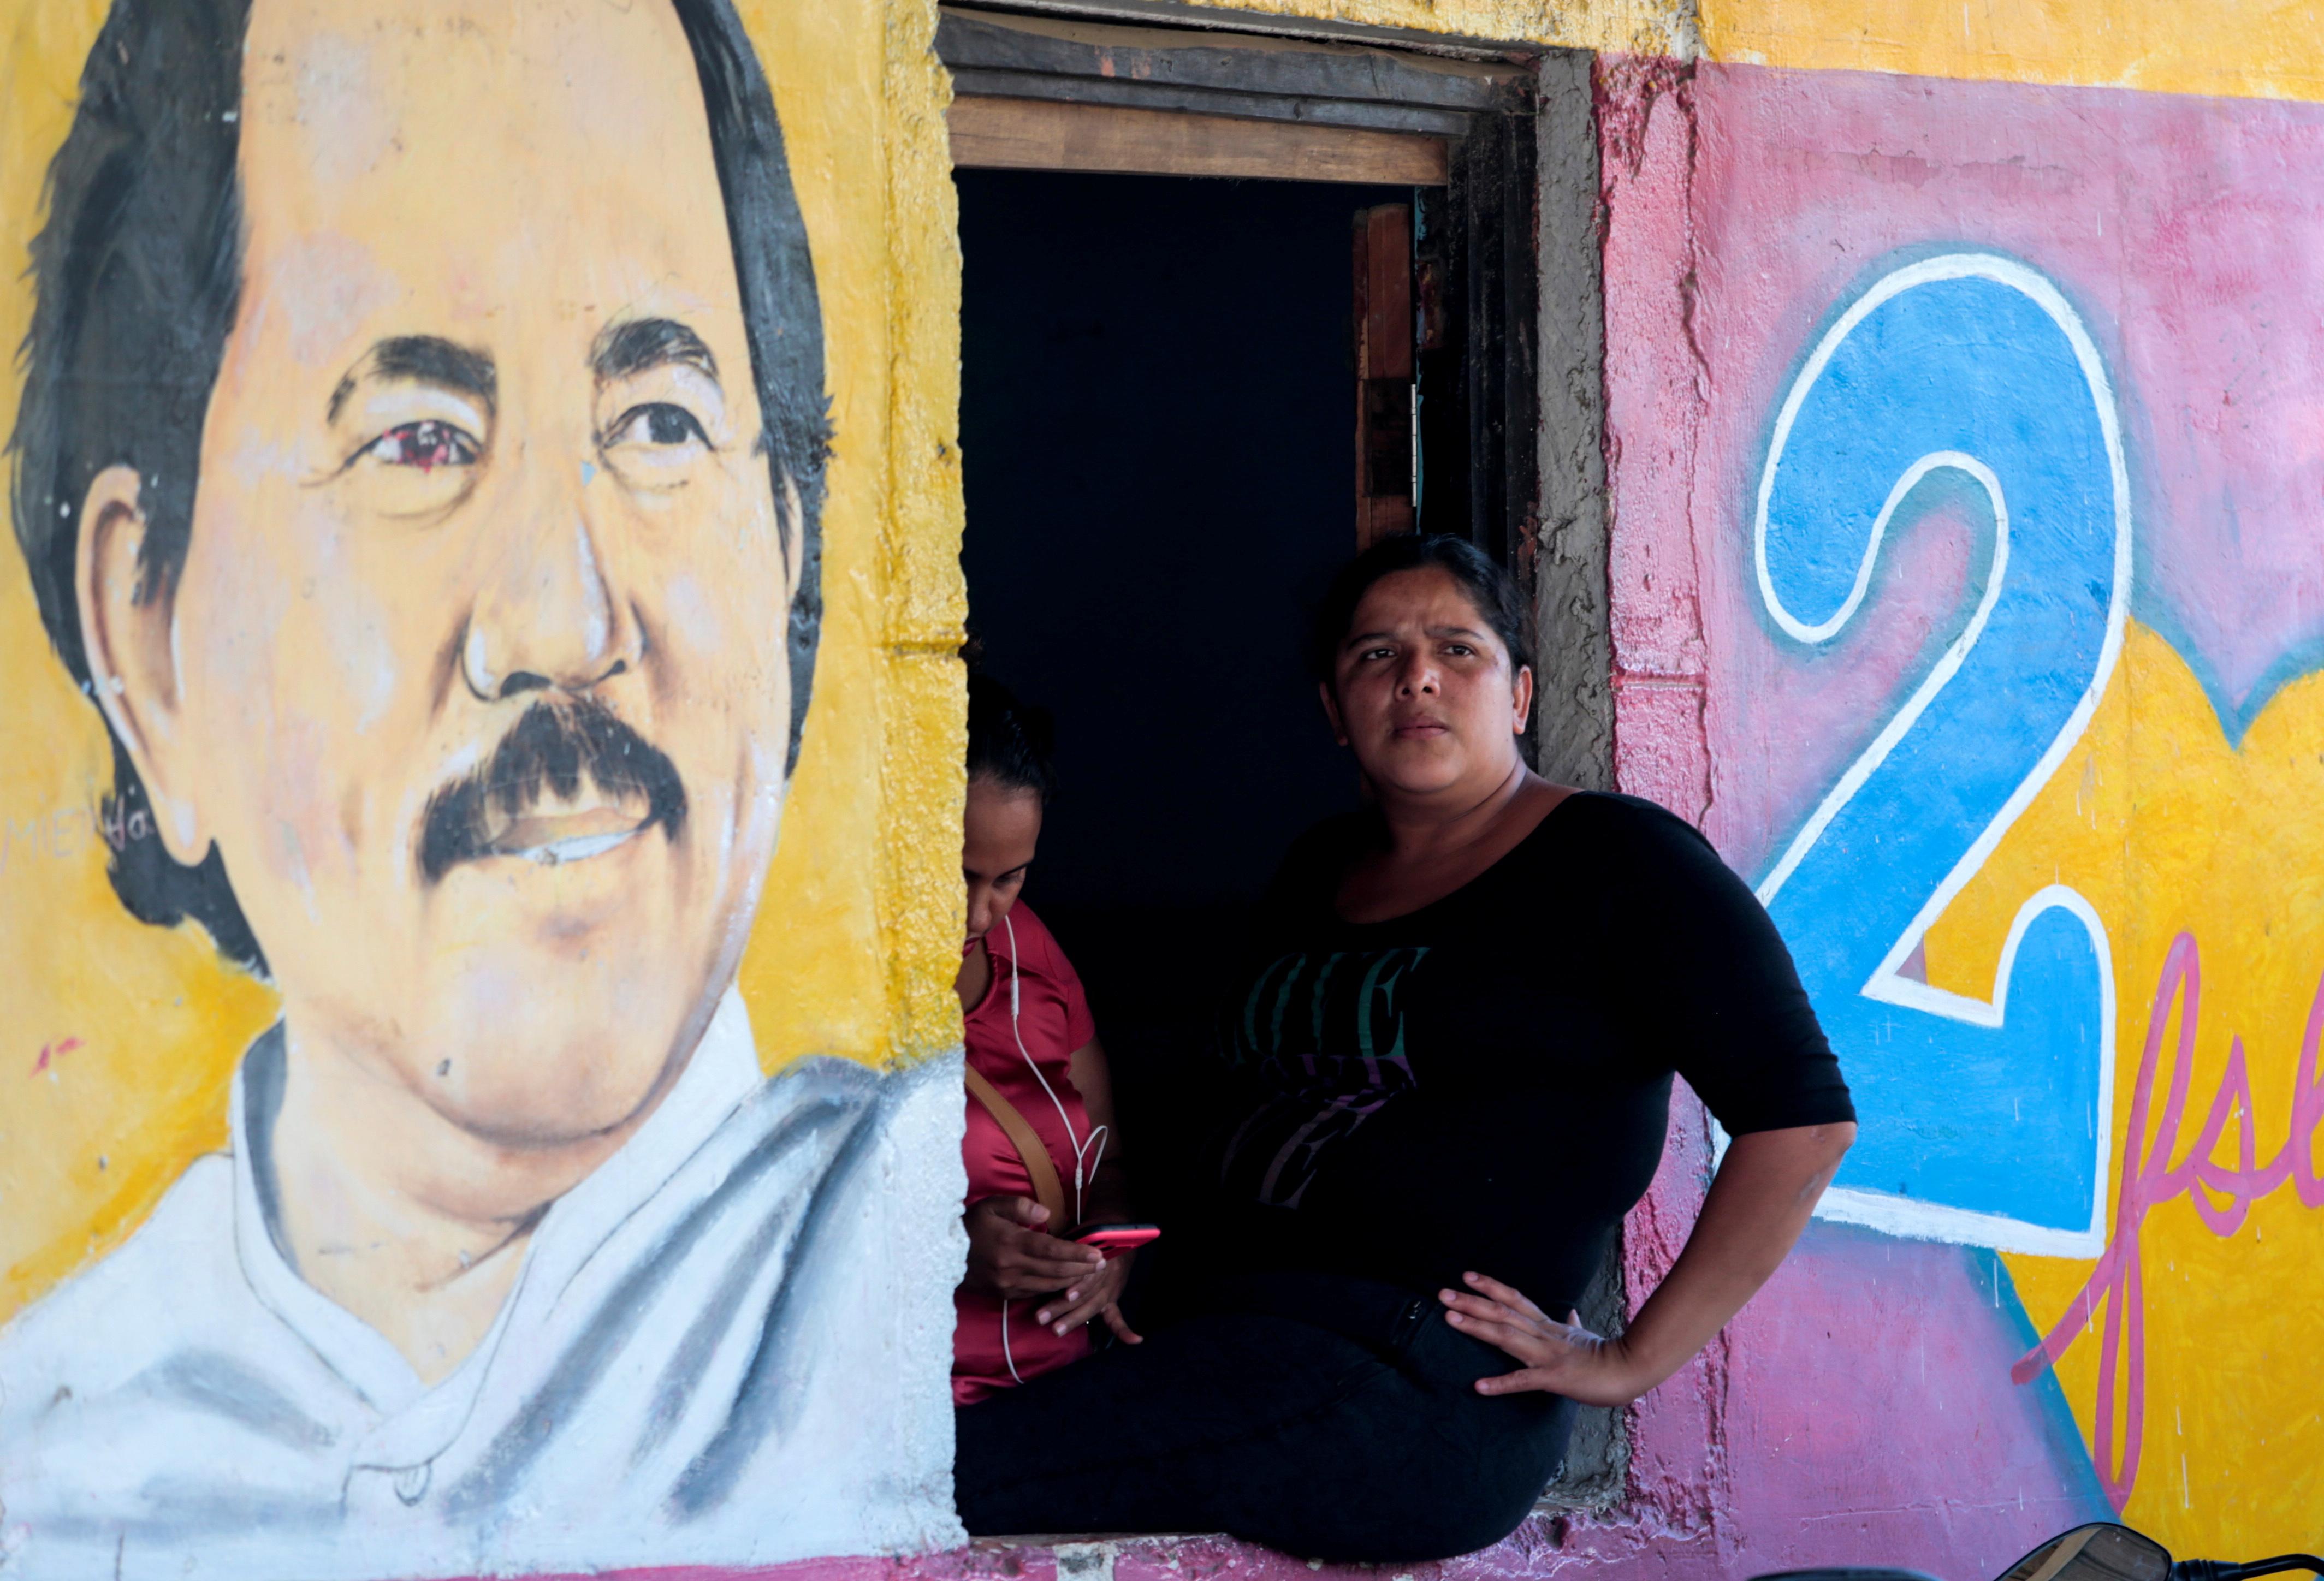 A woman sits next to an image of Nicaragua's President Daniel Ortega in Catarina, Nicaragua October 1, 2020.REUTERS/Oswaldo Rivas/File Photo